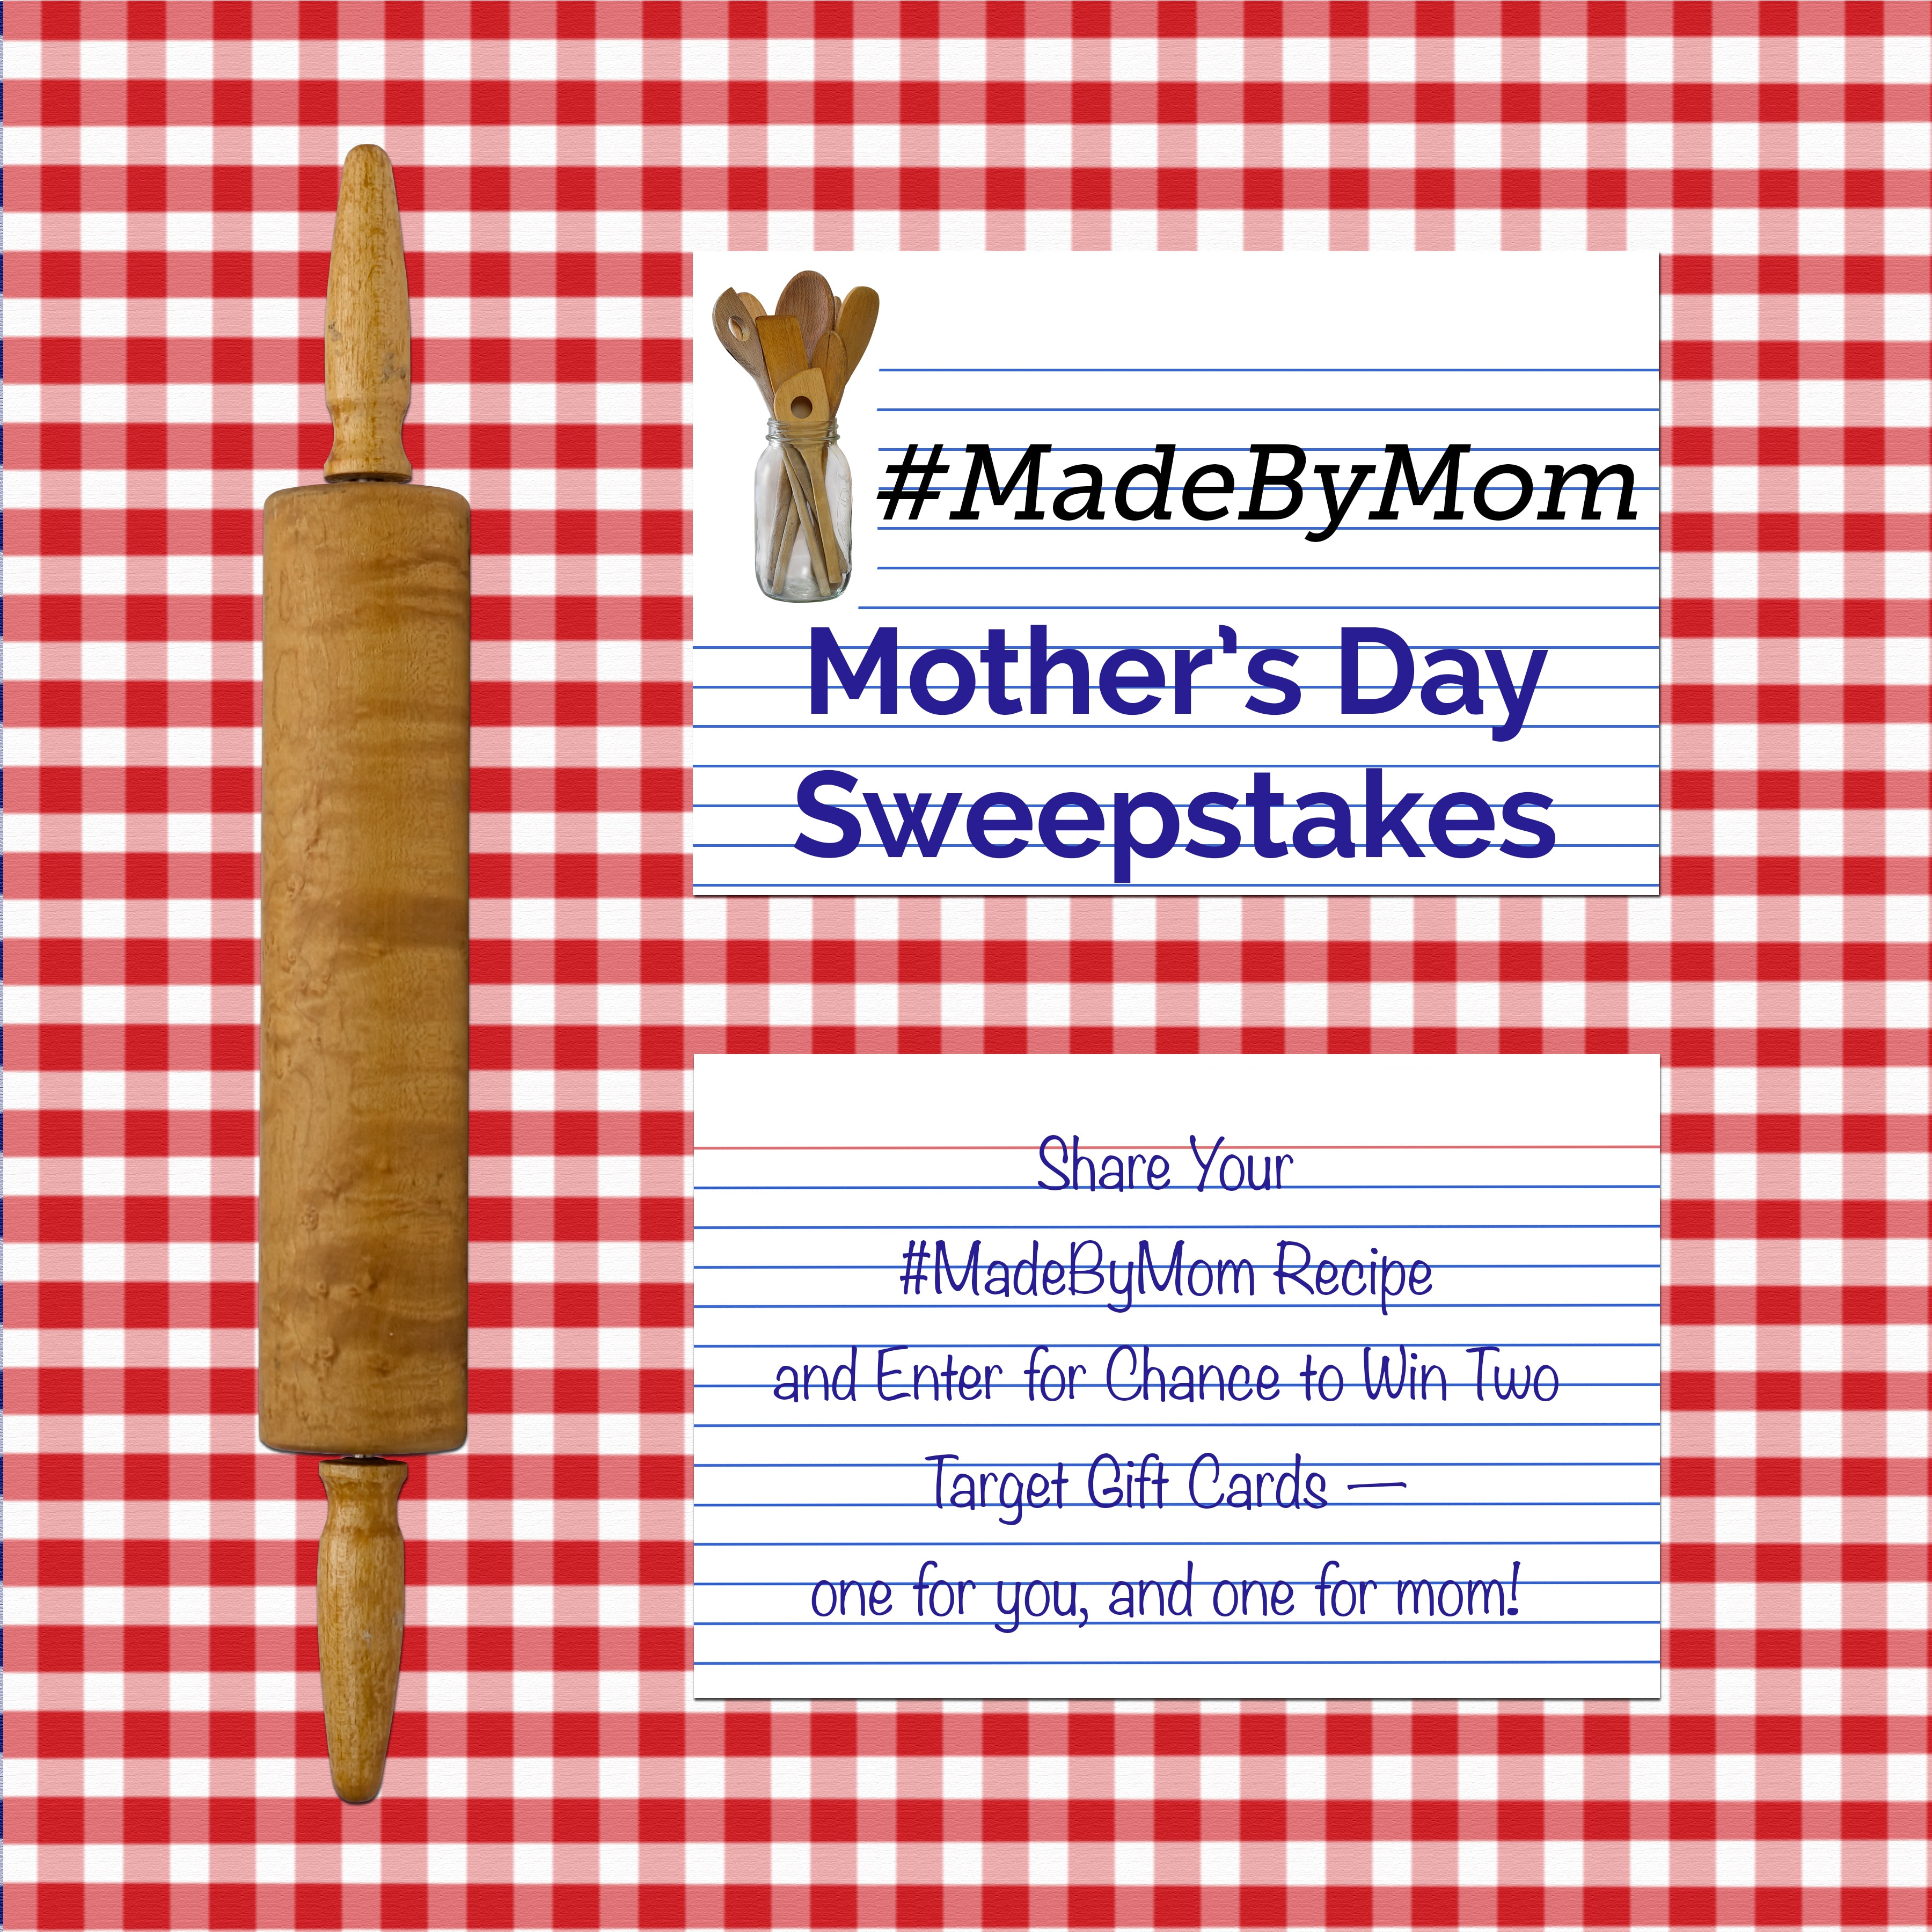 #MadeByMom Mother's Day Sweepstakes | thegoodstuff